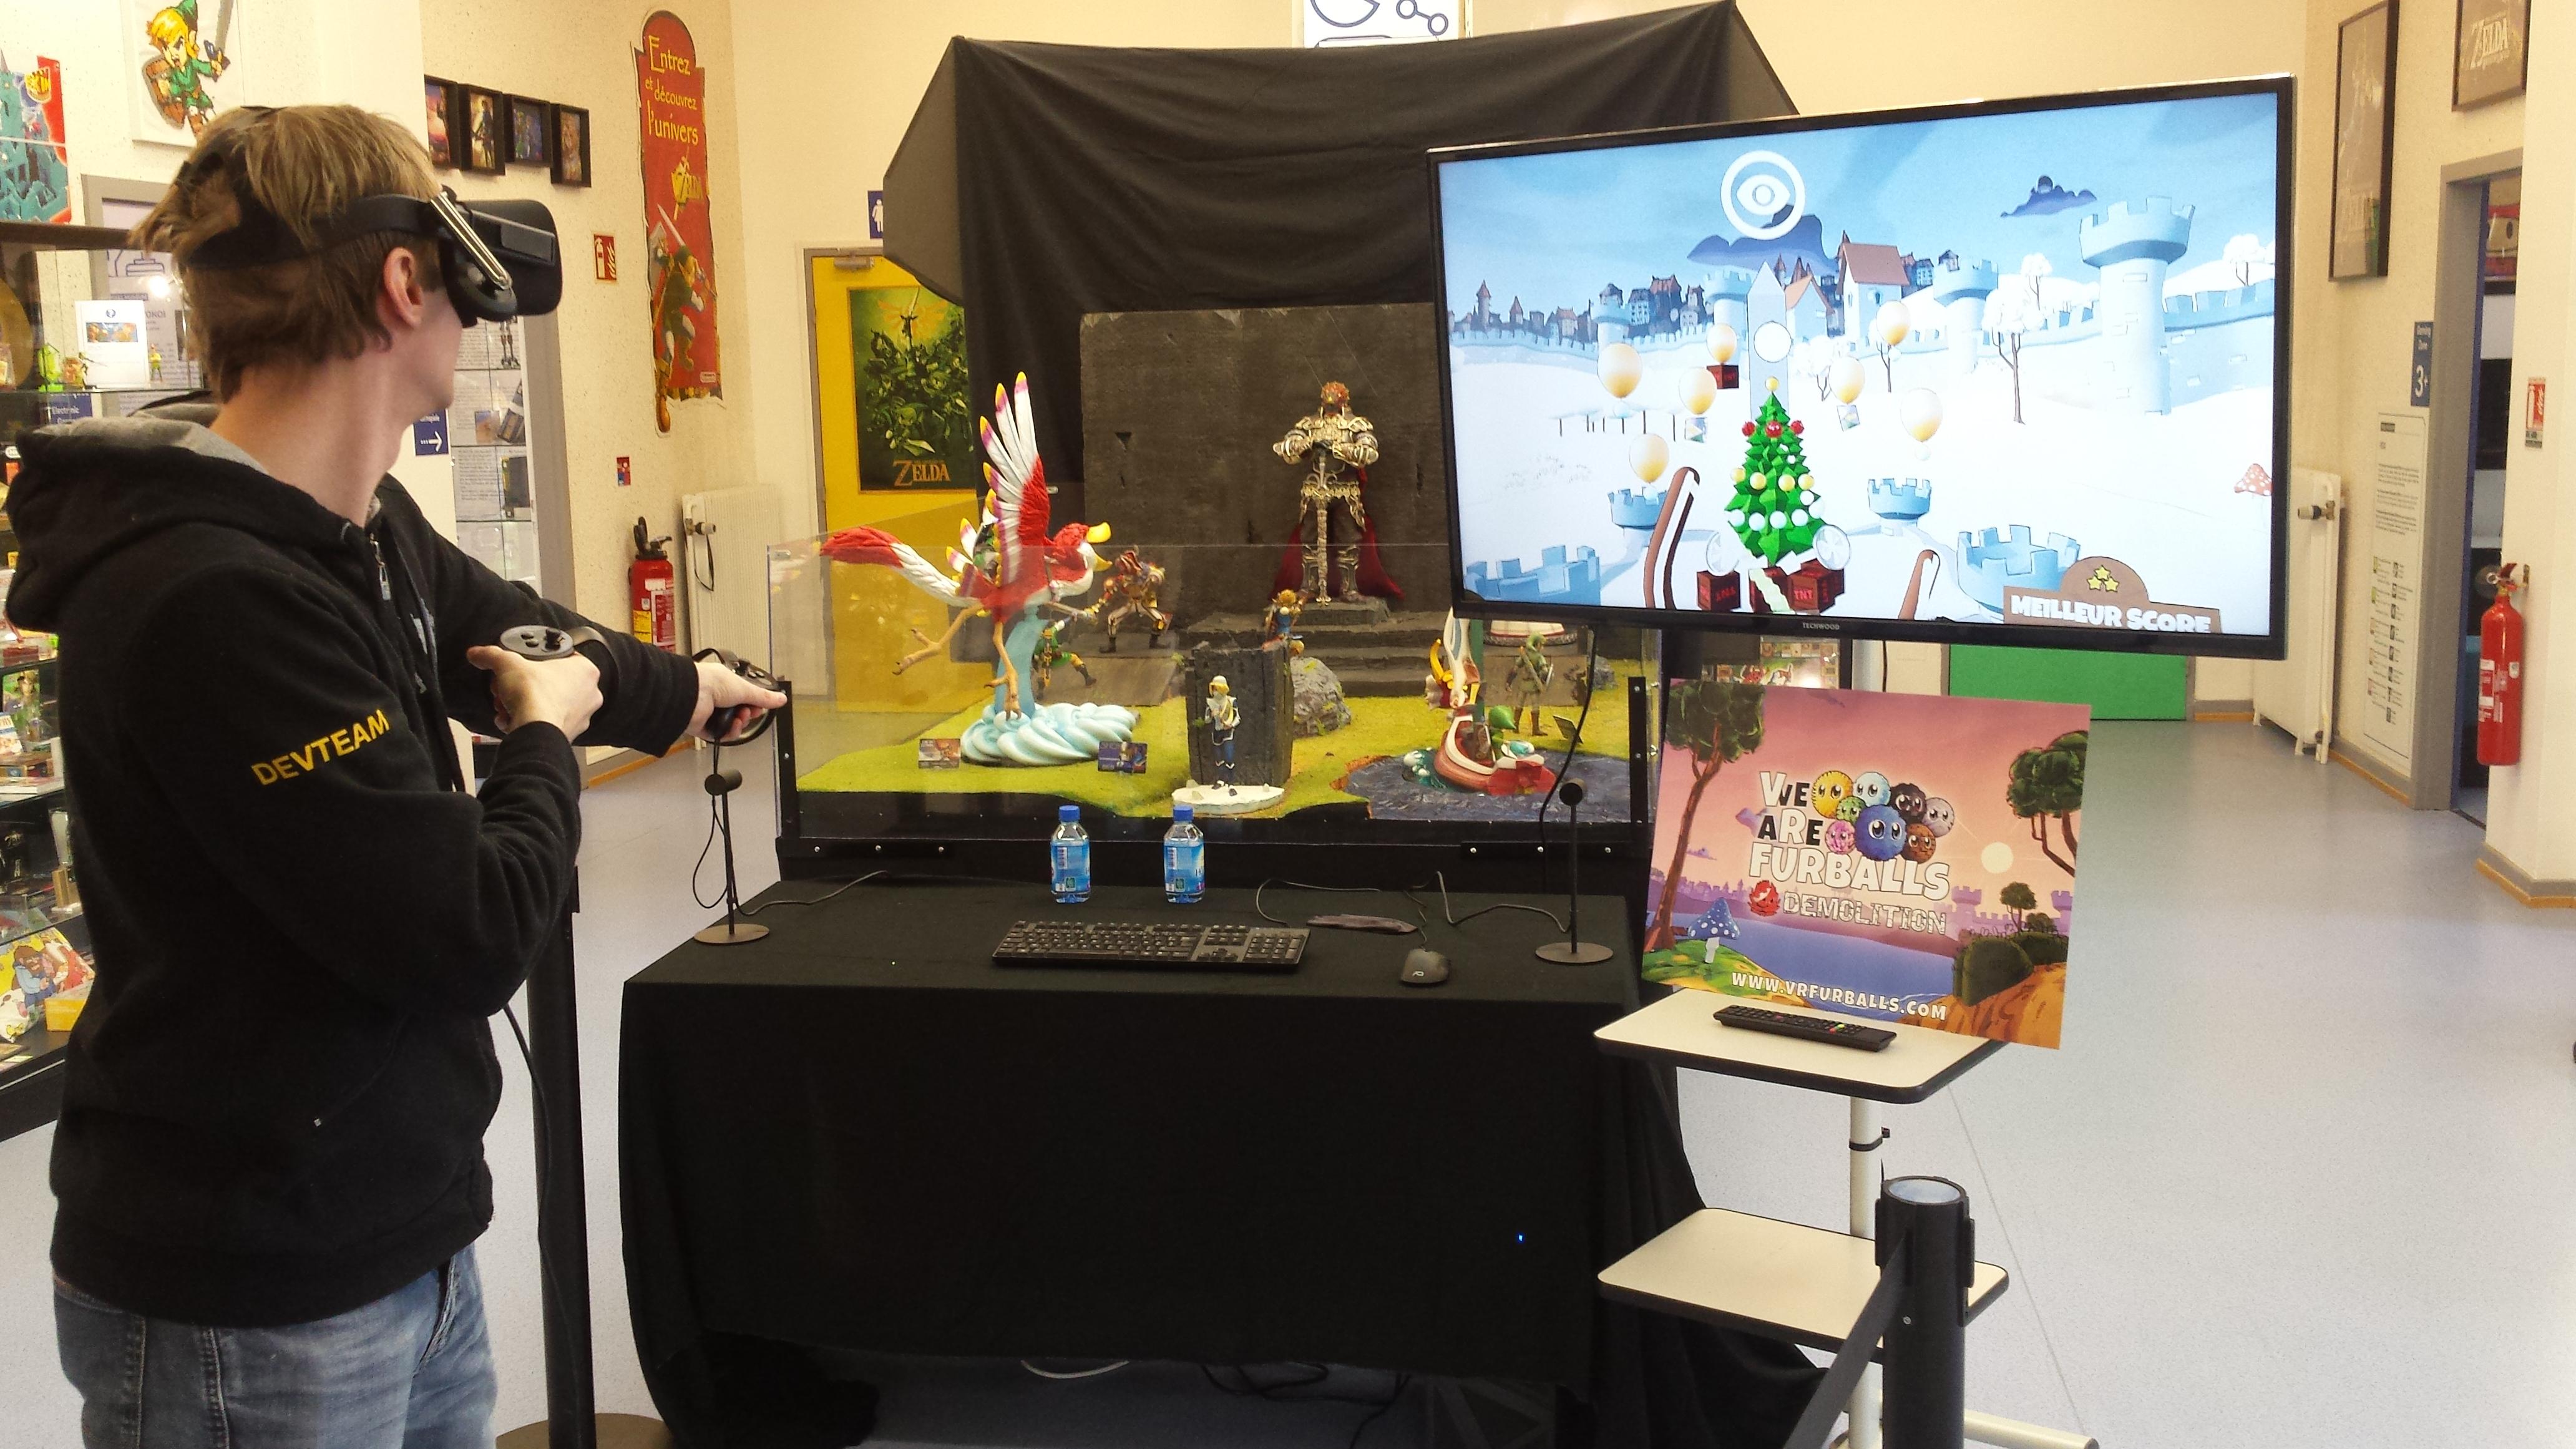 Interview de Steeve Kilhoffer (VR Furballs – Demolition) – 1 an du Pixel Museum